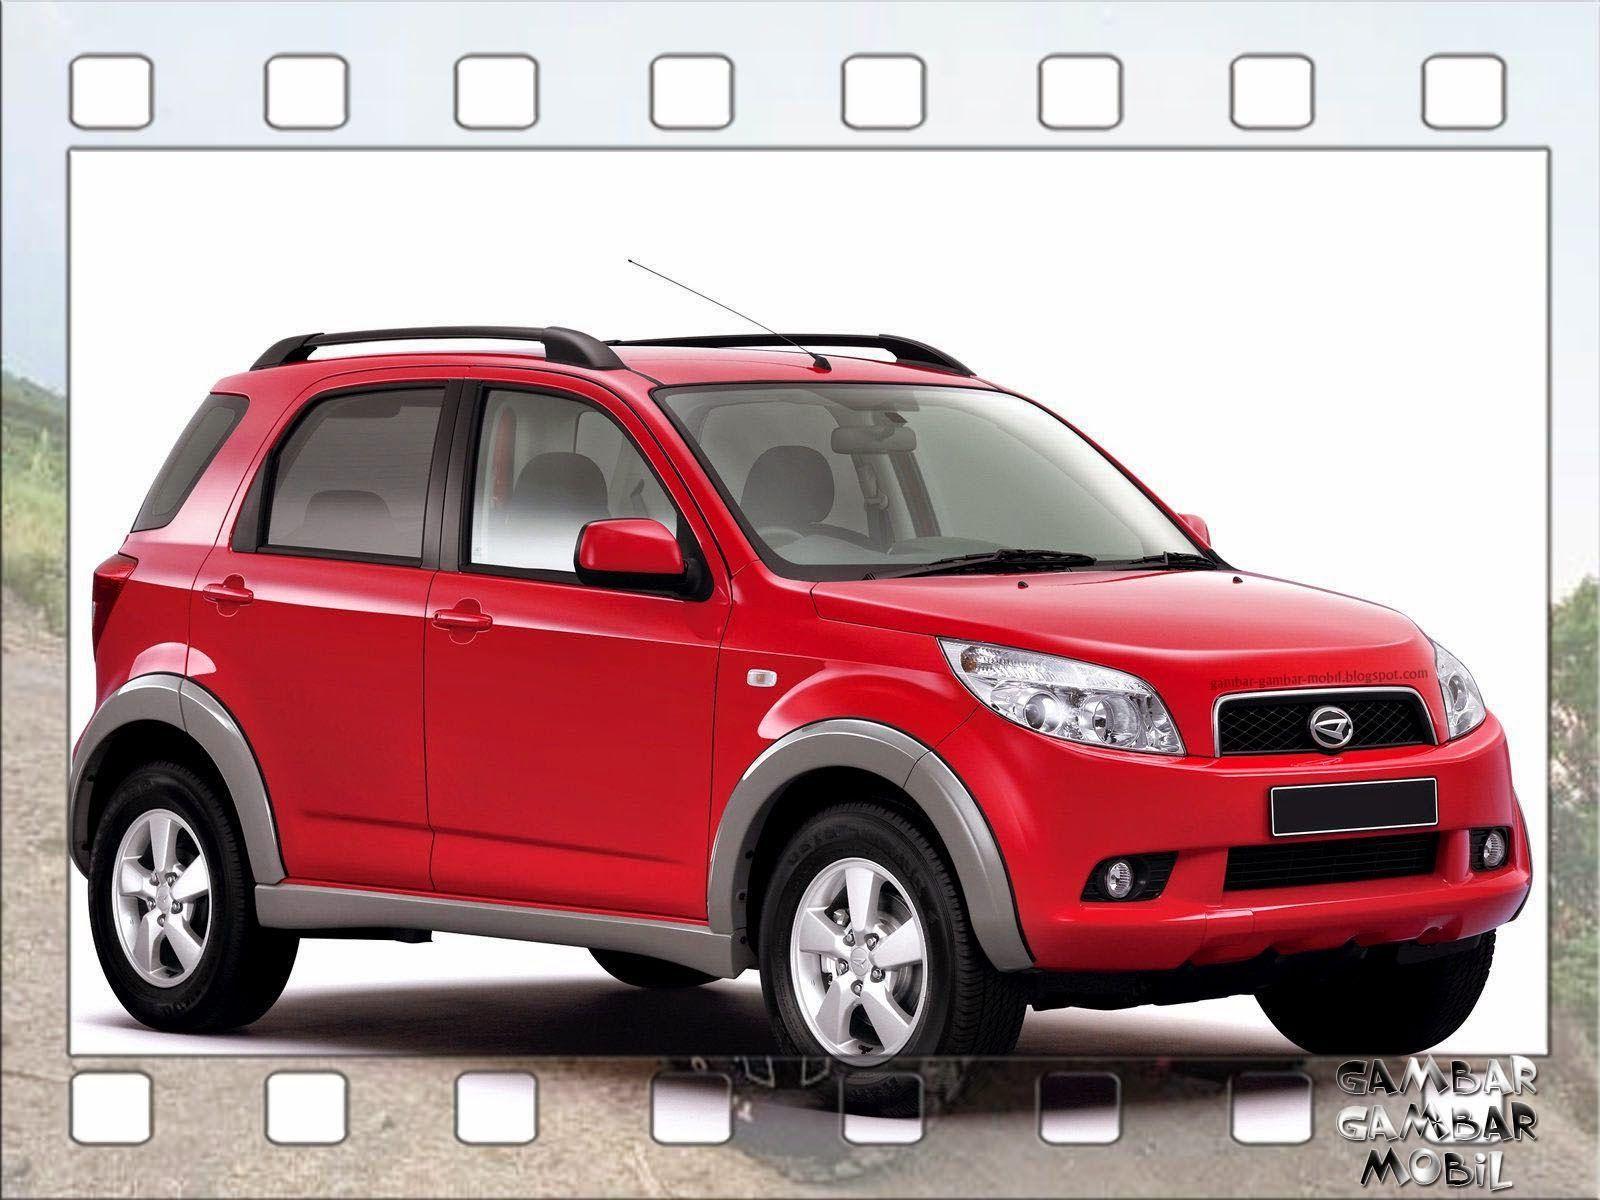 Gambar Mobil Daihatsu Terios Gambar Gambar Mobil Daihatsu Mobil